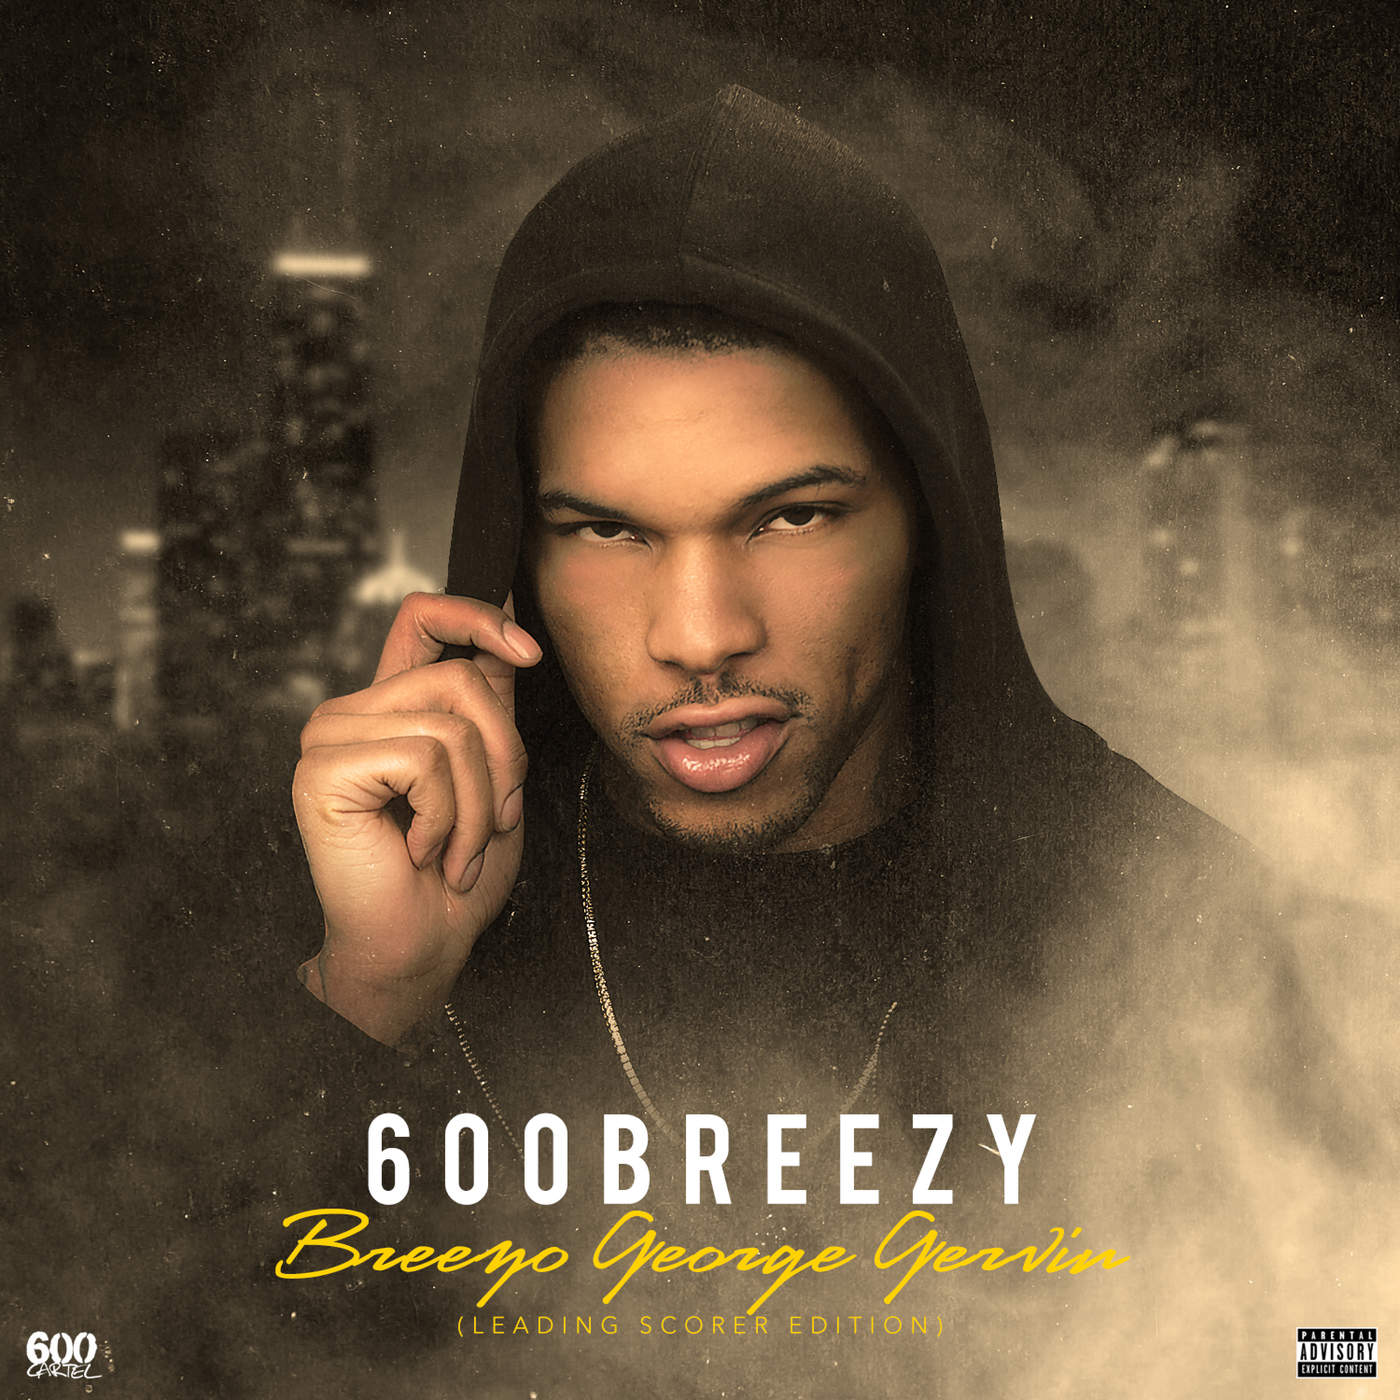 600breezy - Breezo George Gervin (Leading Scorer Edition) Cover